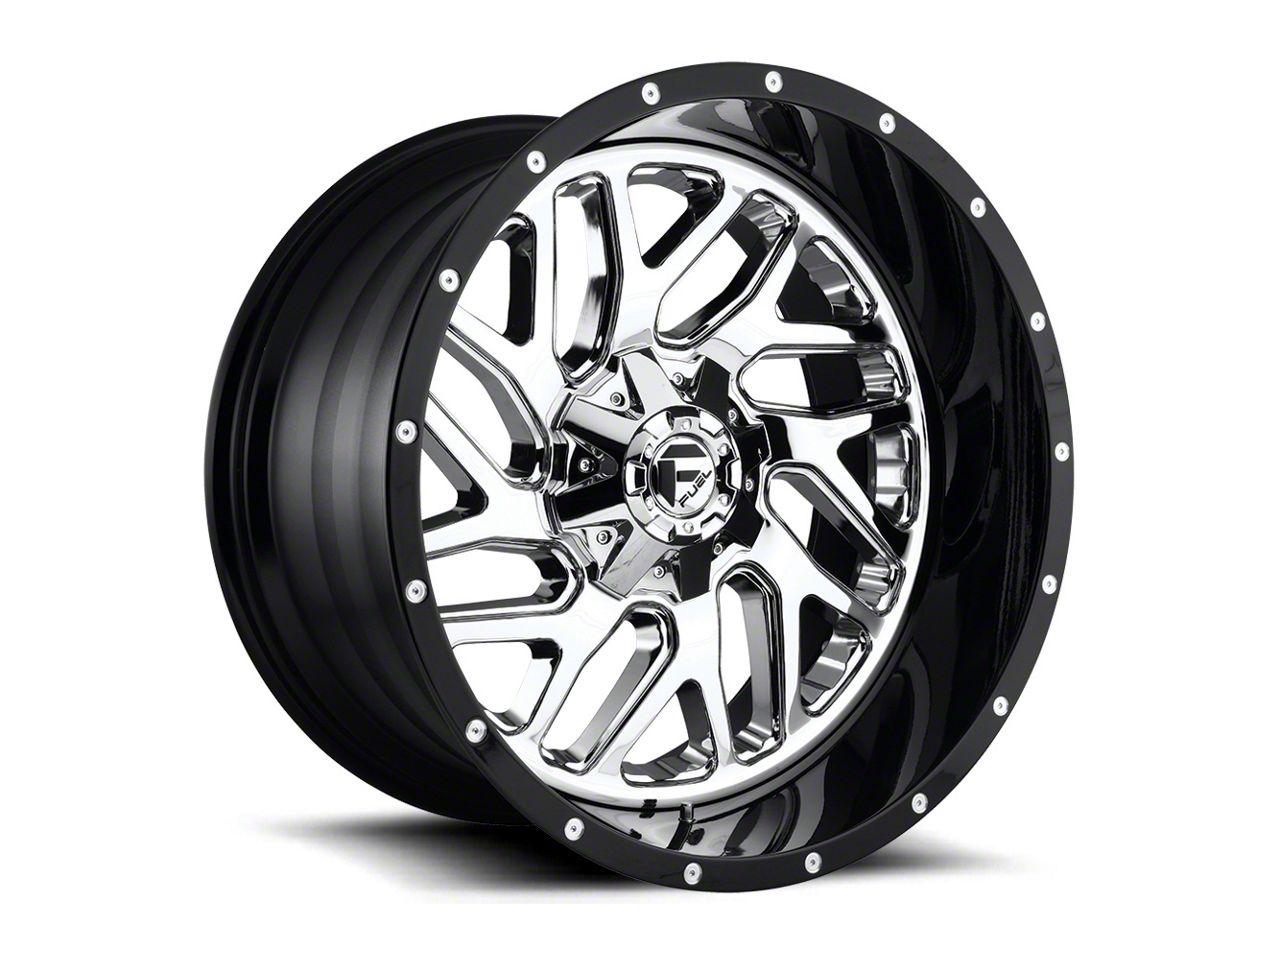 fuel wheels ram triton chrome 5 lug wheel 22x12 d21122207047 02 2000 Dodge Ram 1500 fuel wheels triton chrome 5 lug wheel 22x12 02 18 ram 1500